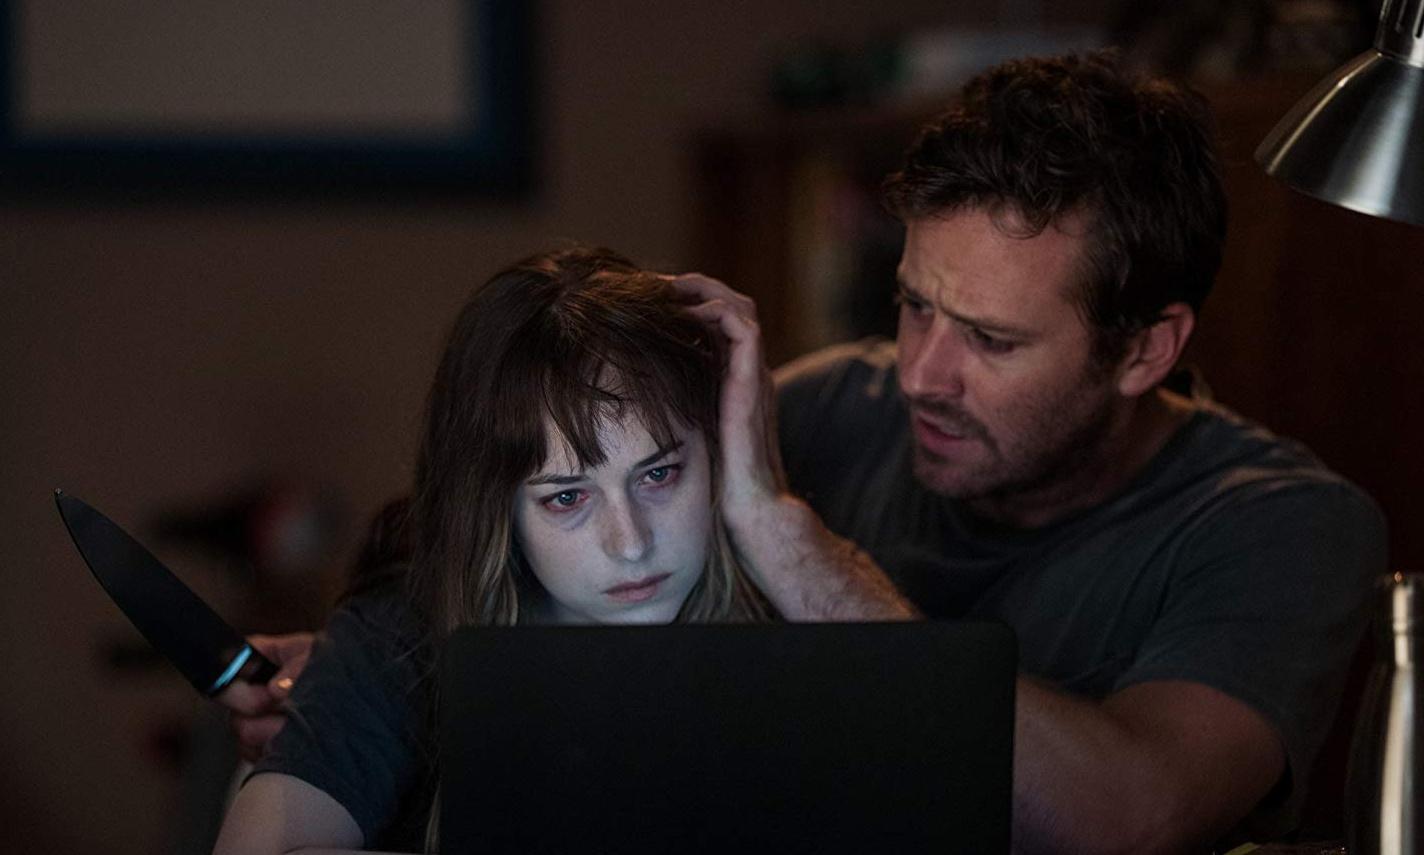 Directors' Fortnight risks Cannes festival rupture by choosing Netflix film